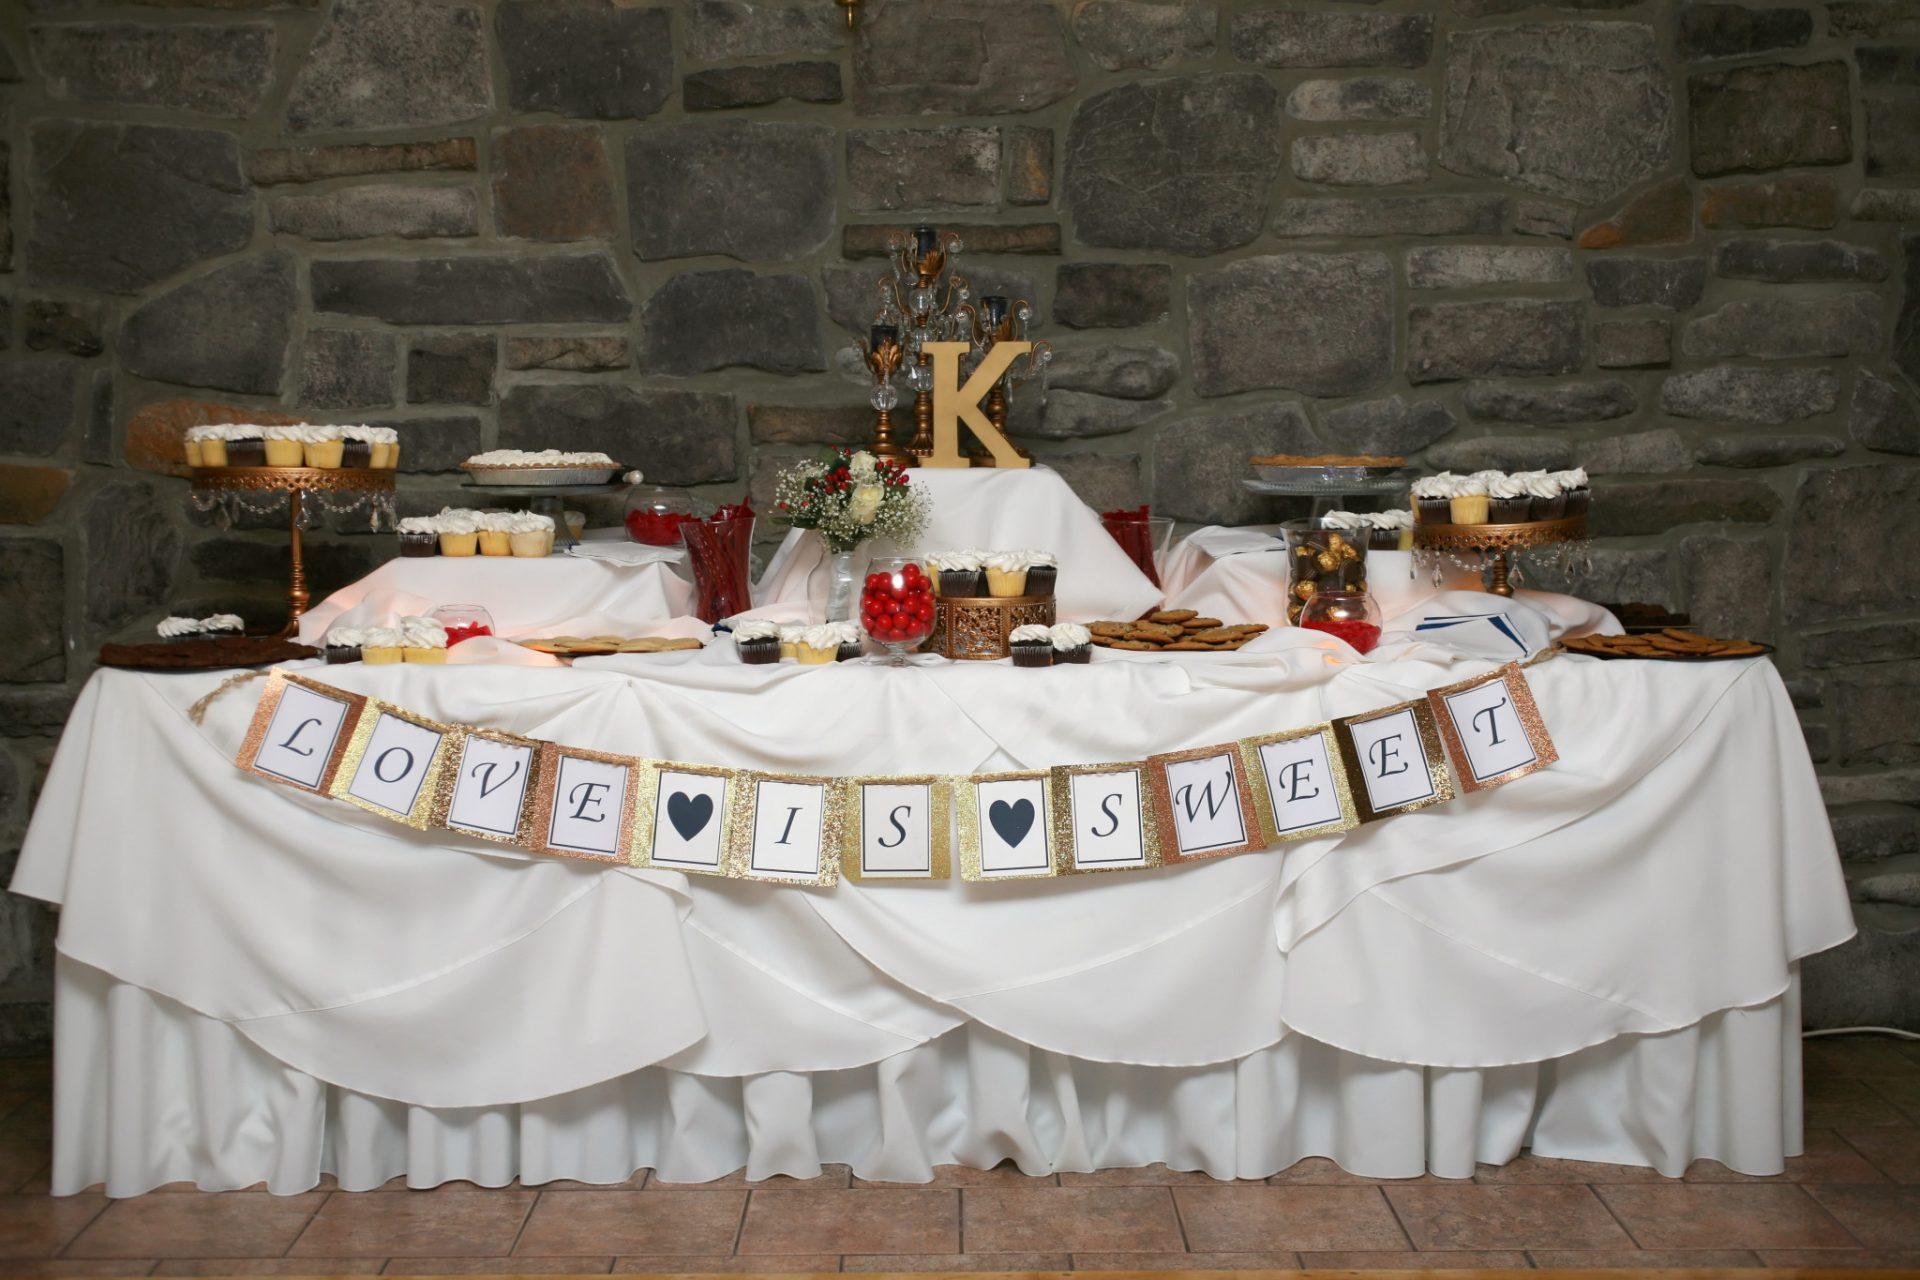 Top 3 Creative Wedding Favor Ideas Of 2015 Morningside Inn